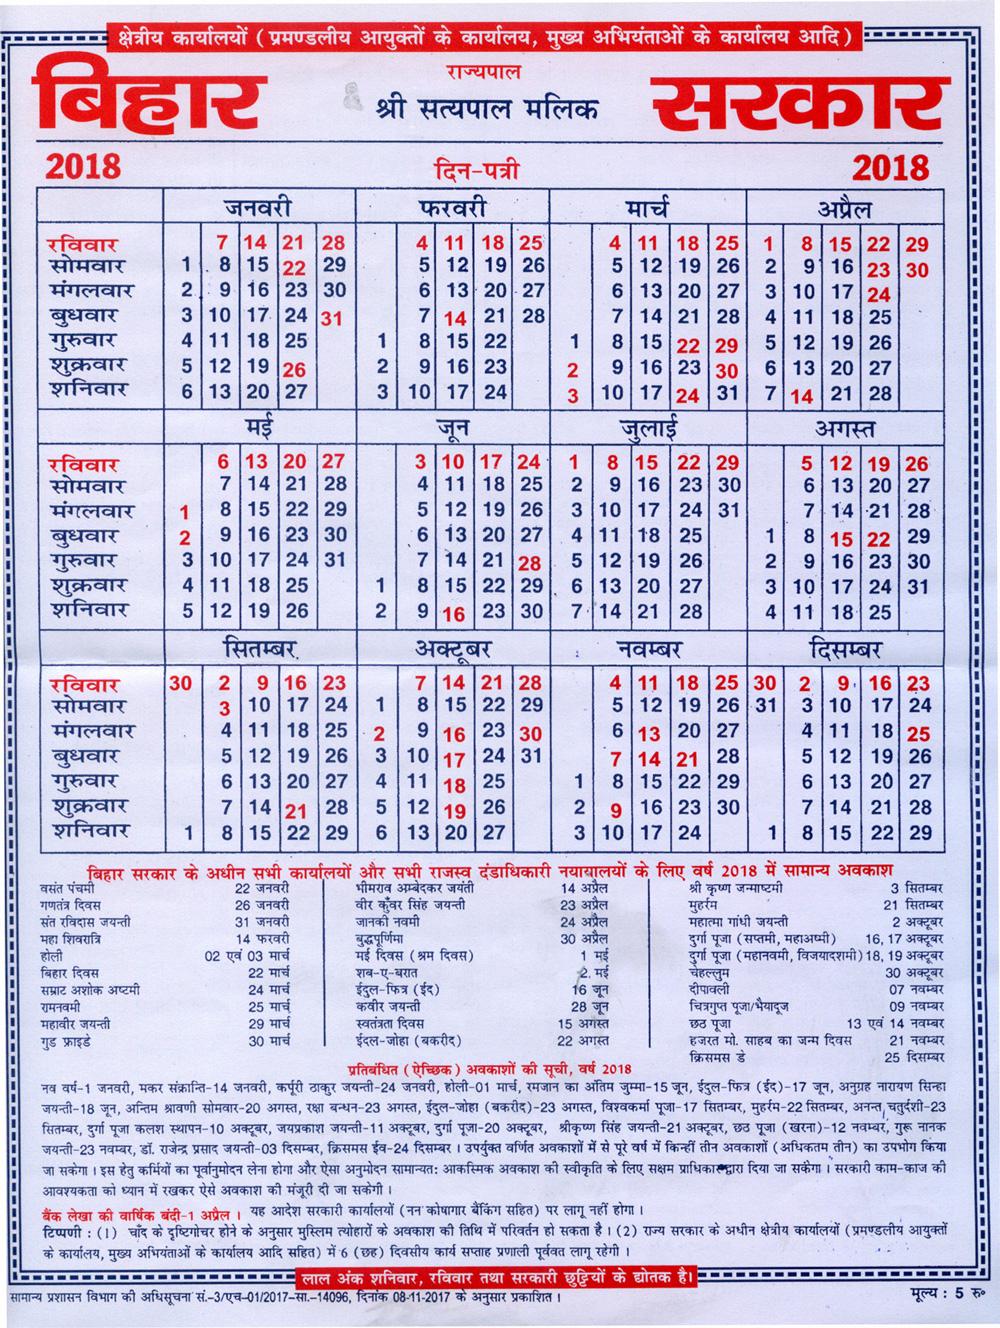 Bihar Govt. Calendar 2018, Bihar Govt. Holiday List, Holiday inside Bihar Govt 2020 Calendar